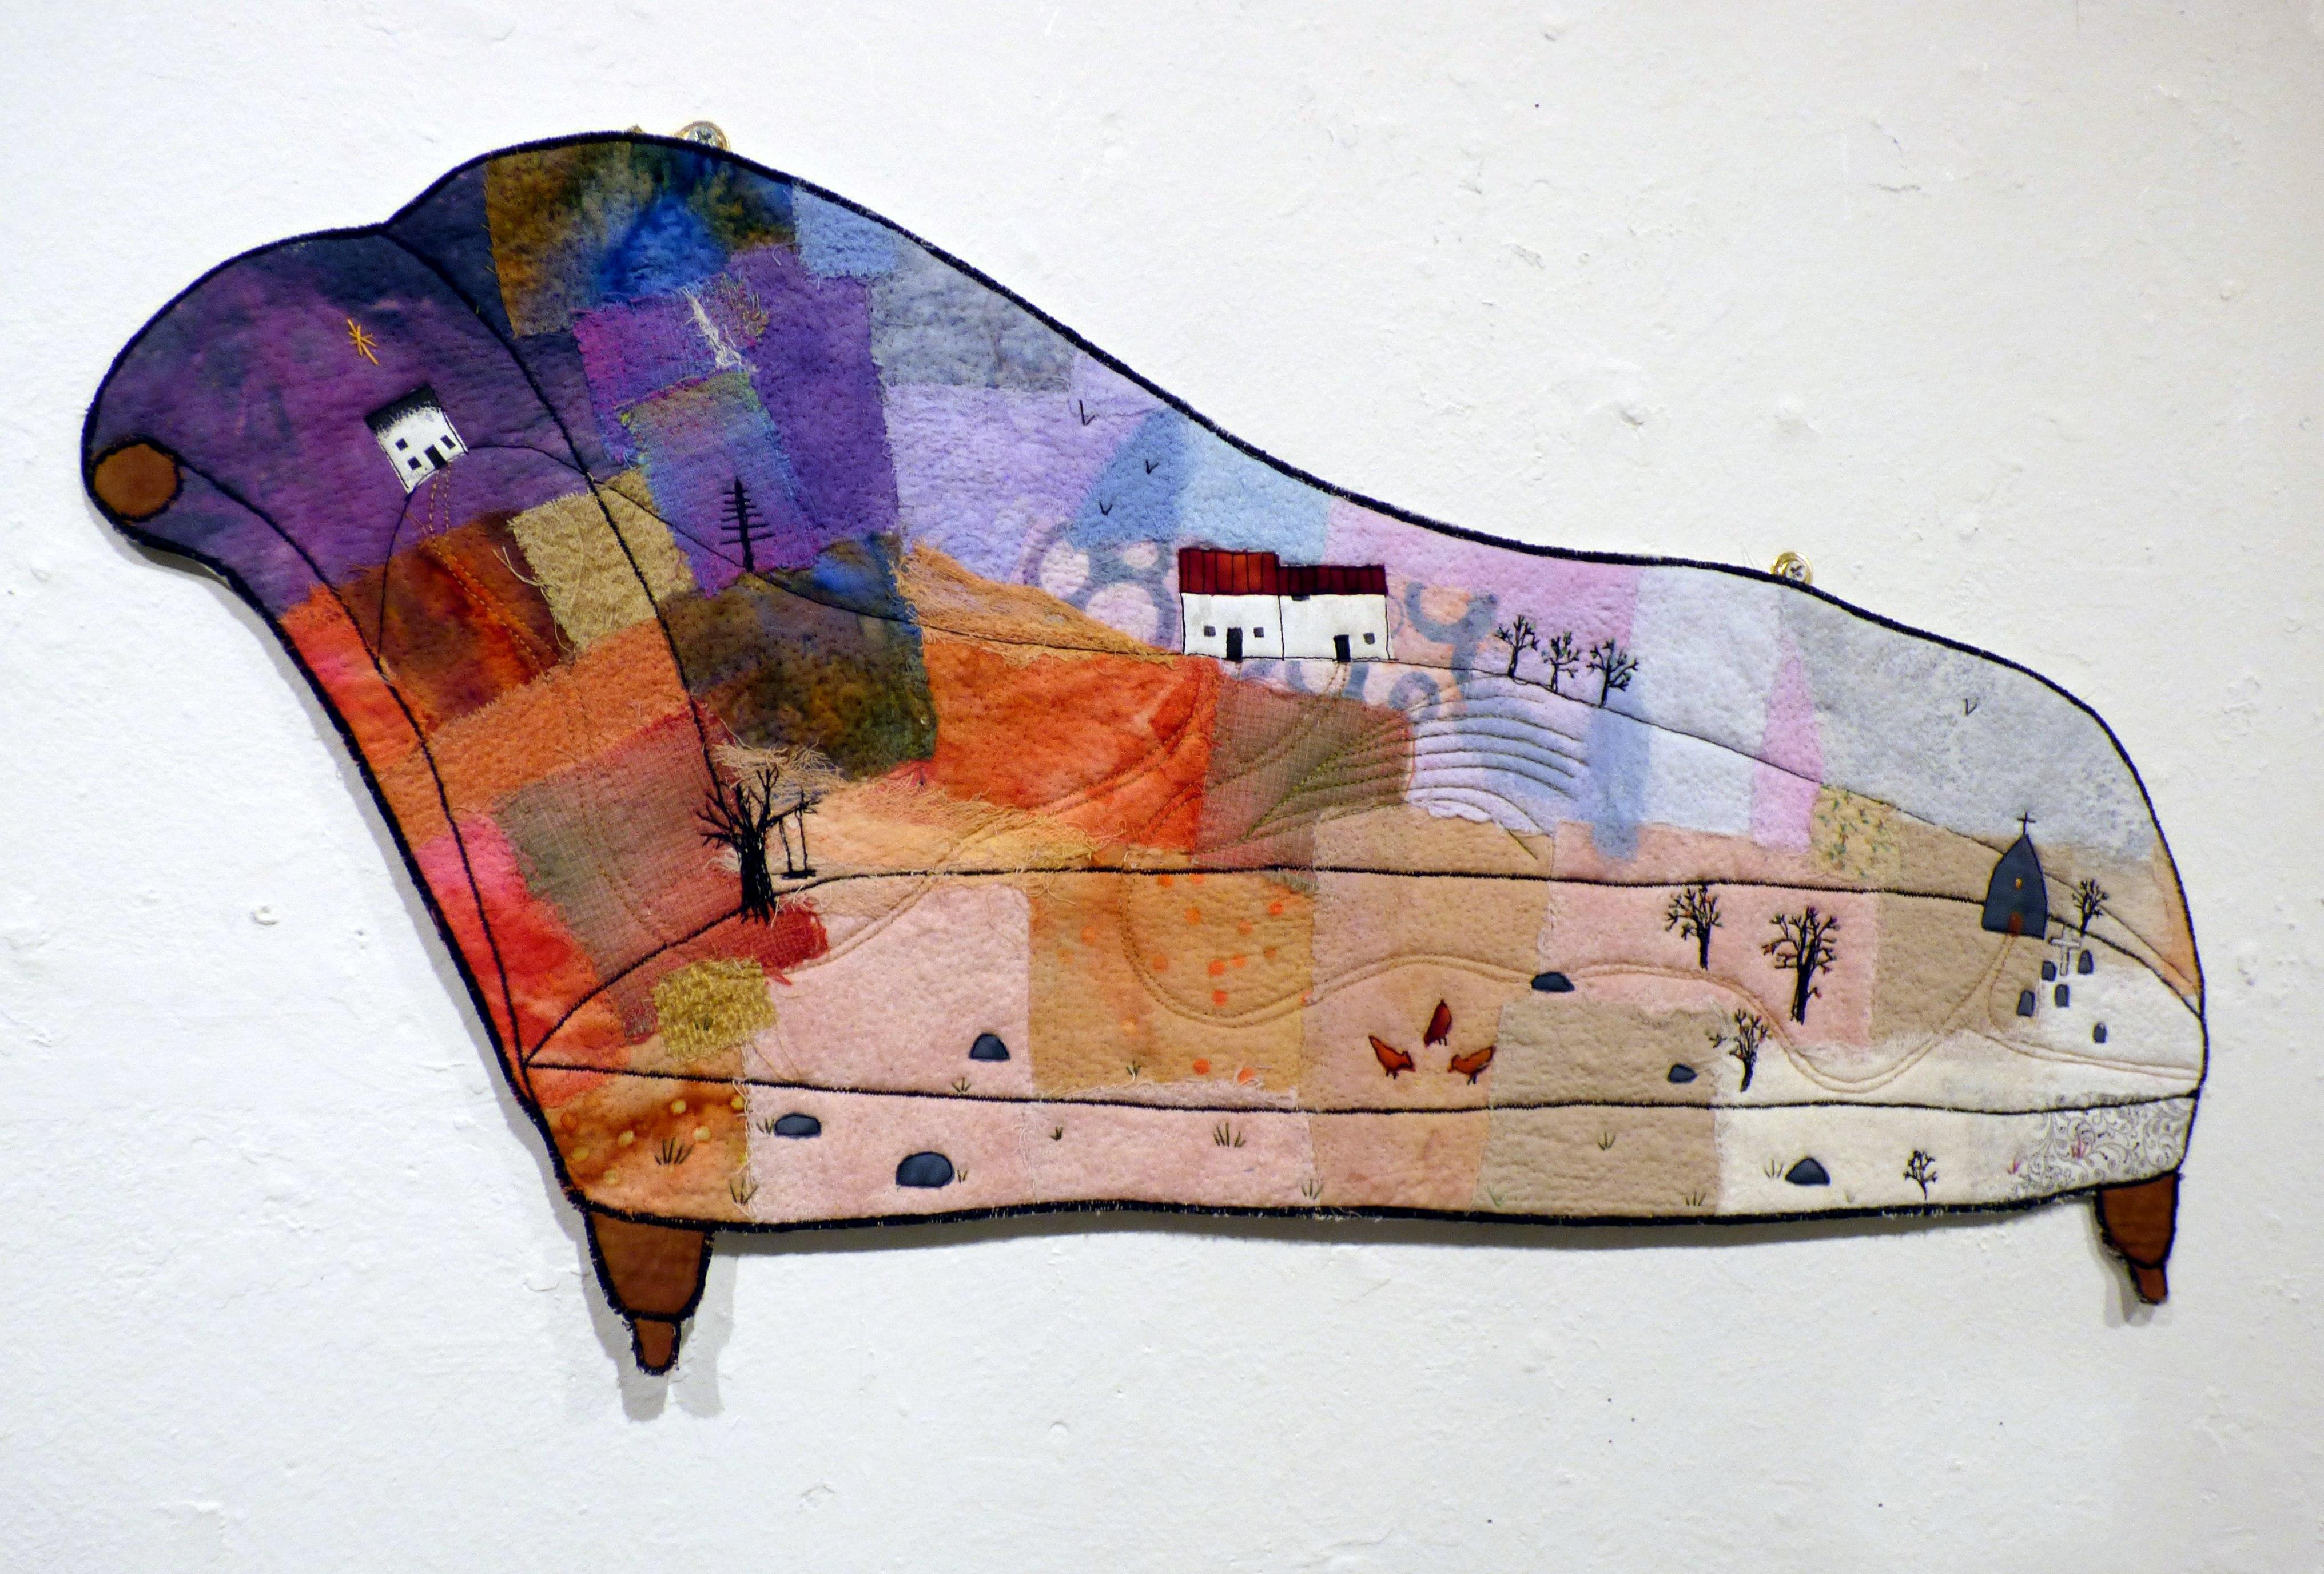 CHAISE by Michelle Barnard, Ten Plus exhibition, Nantwich